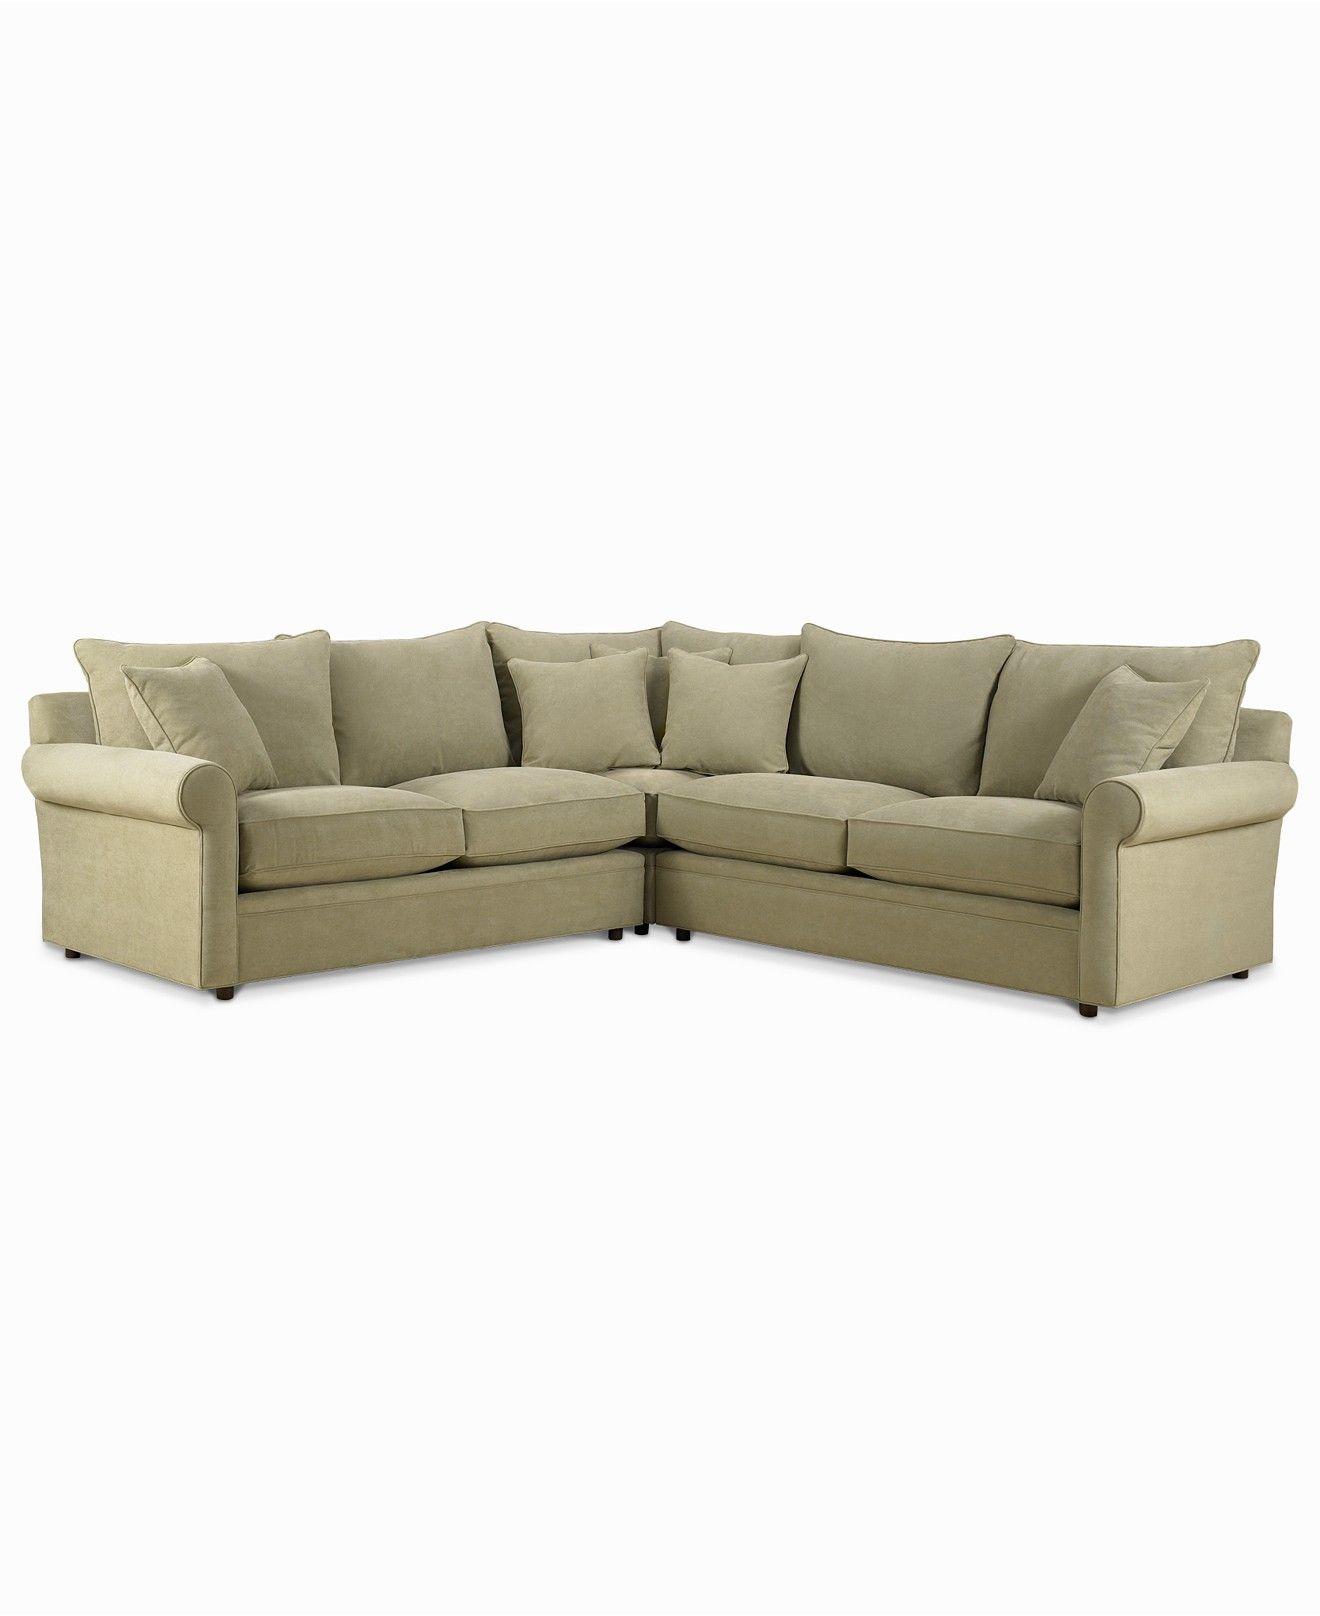 Doss Fabric Microfiber 3-Piece Sectional Sofa - Furniture ...